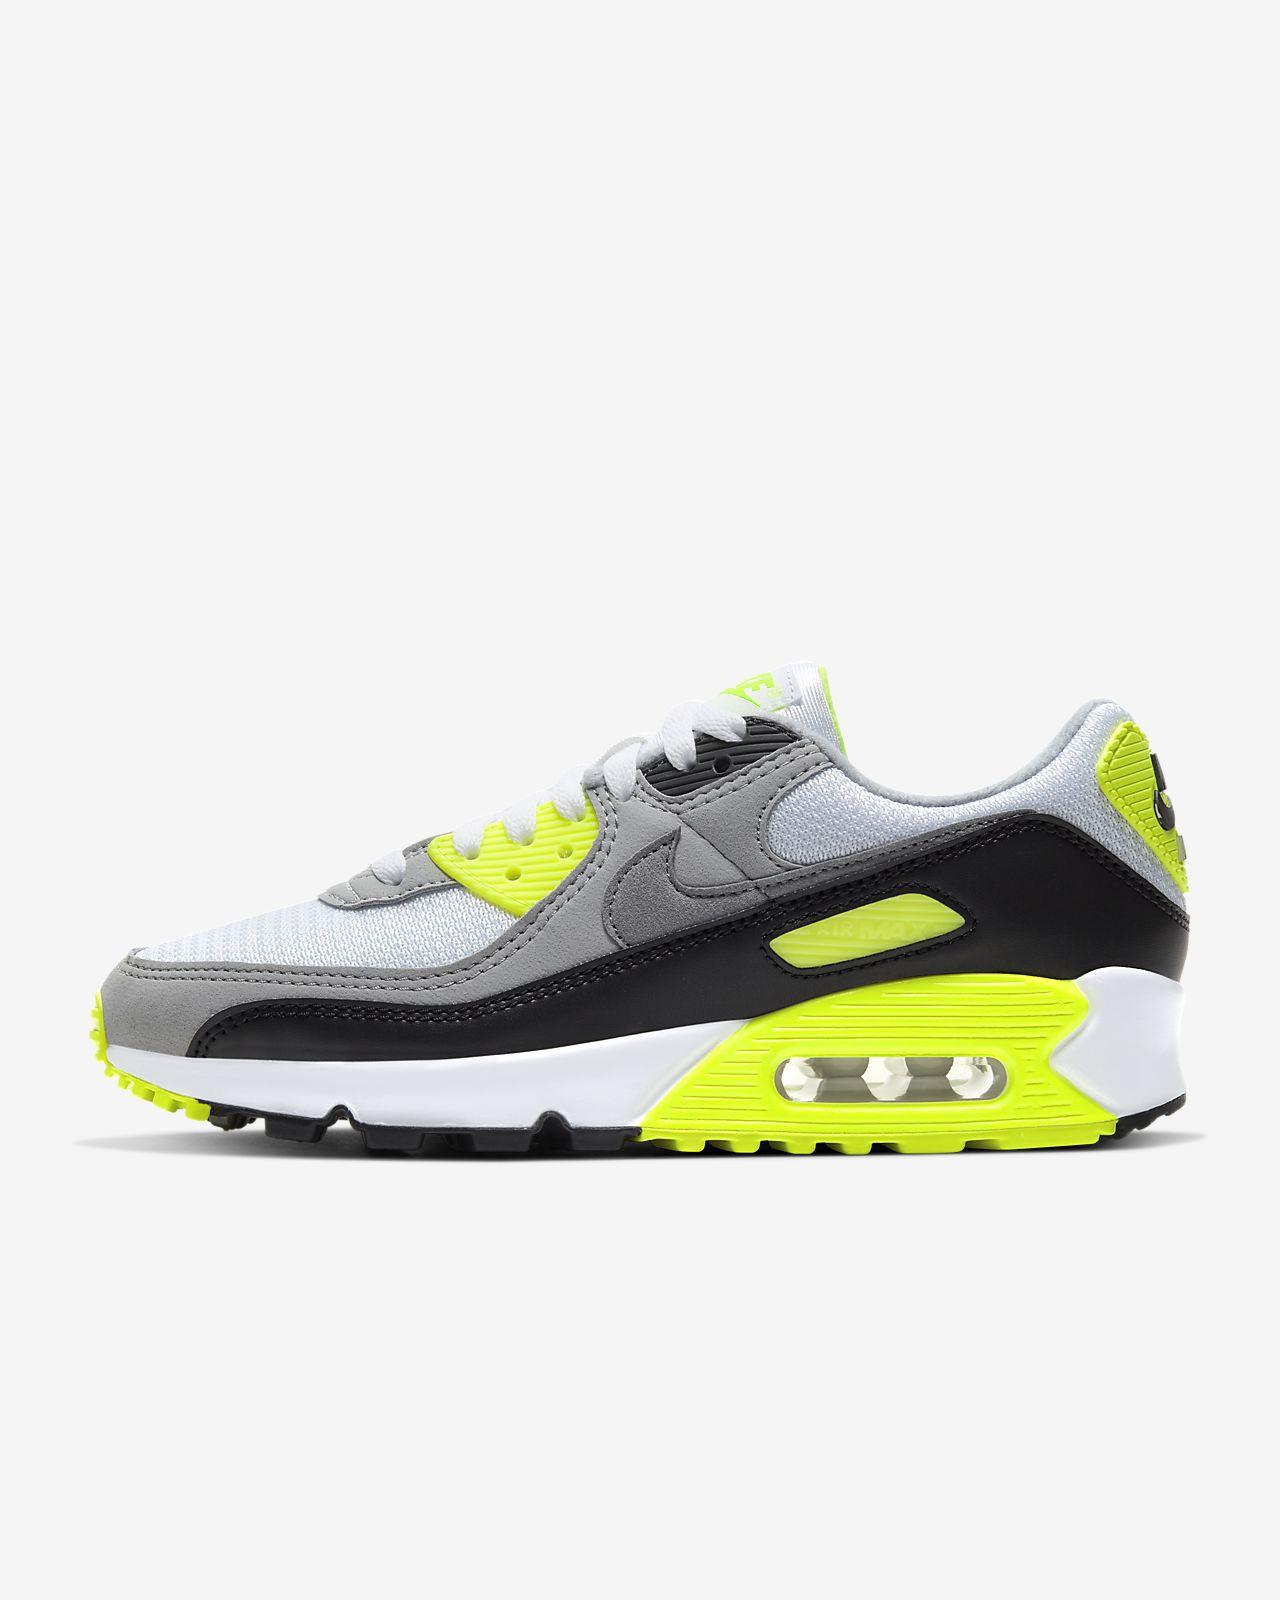 Air max 90 infant | Air max 90, Air max sneakers, Air max 90